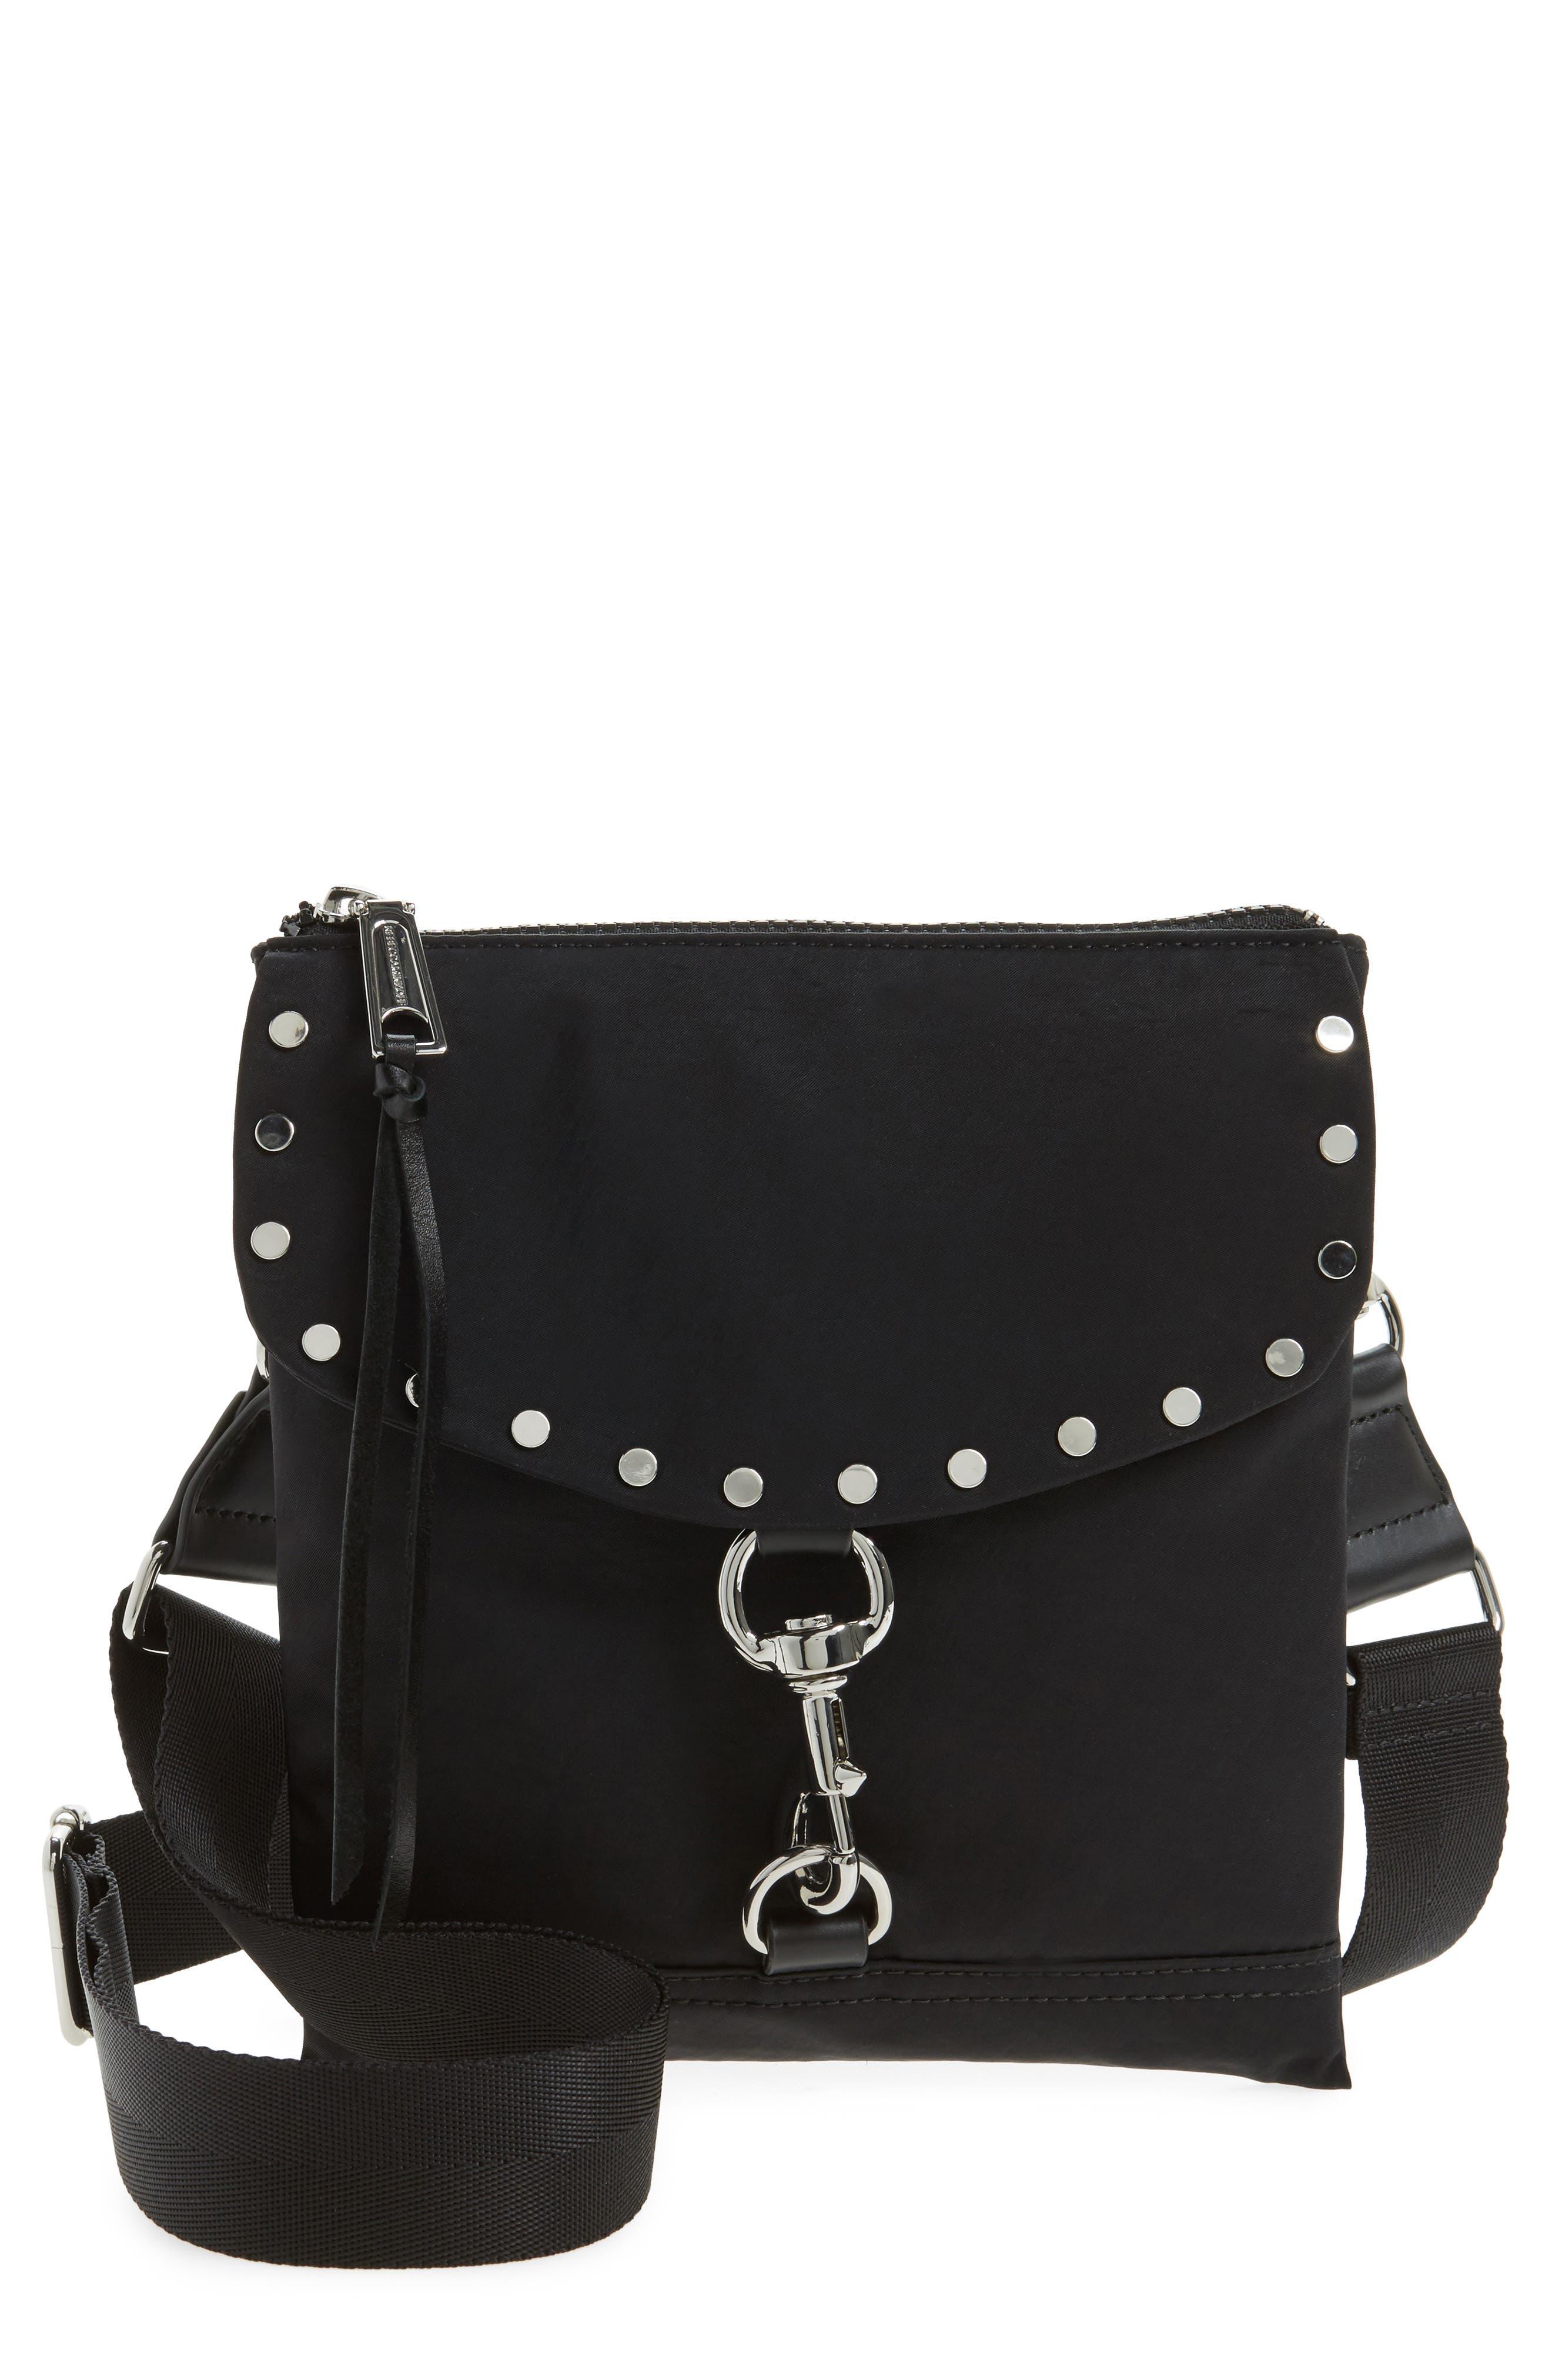 Rebecca Minkoff Nylon Flap Crossbody Bag